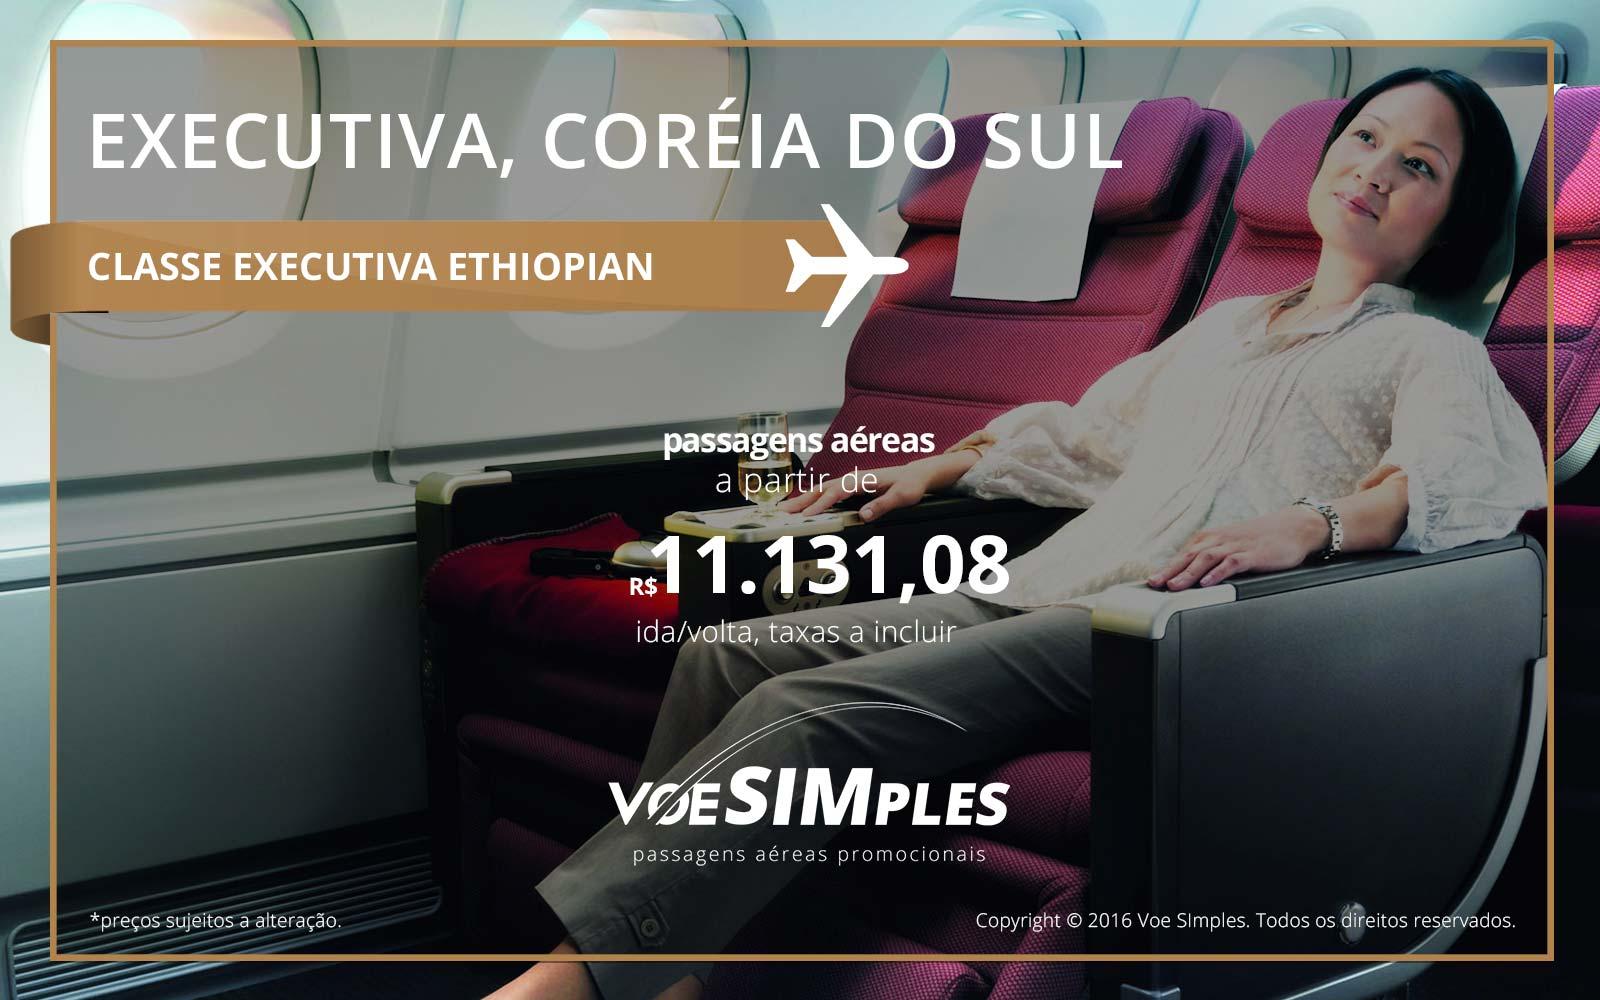 Passagem aérea Classe Executiva Ethiopian Airlines para Coreia do Sul